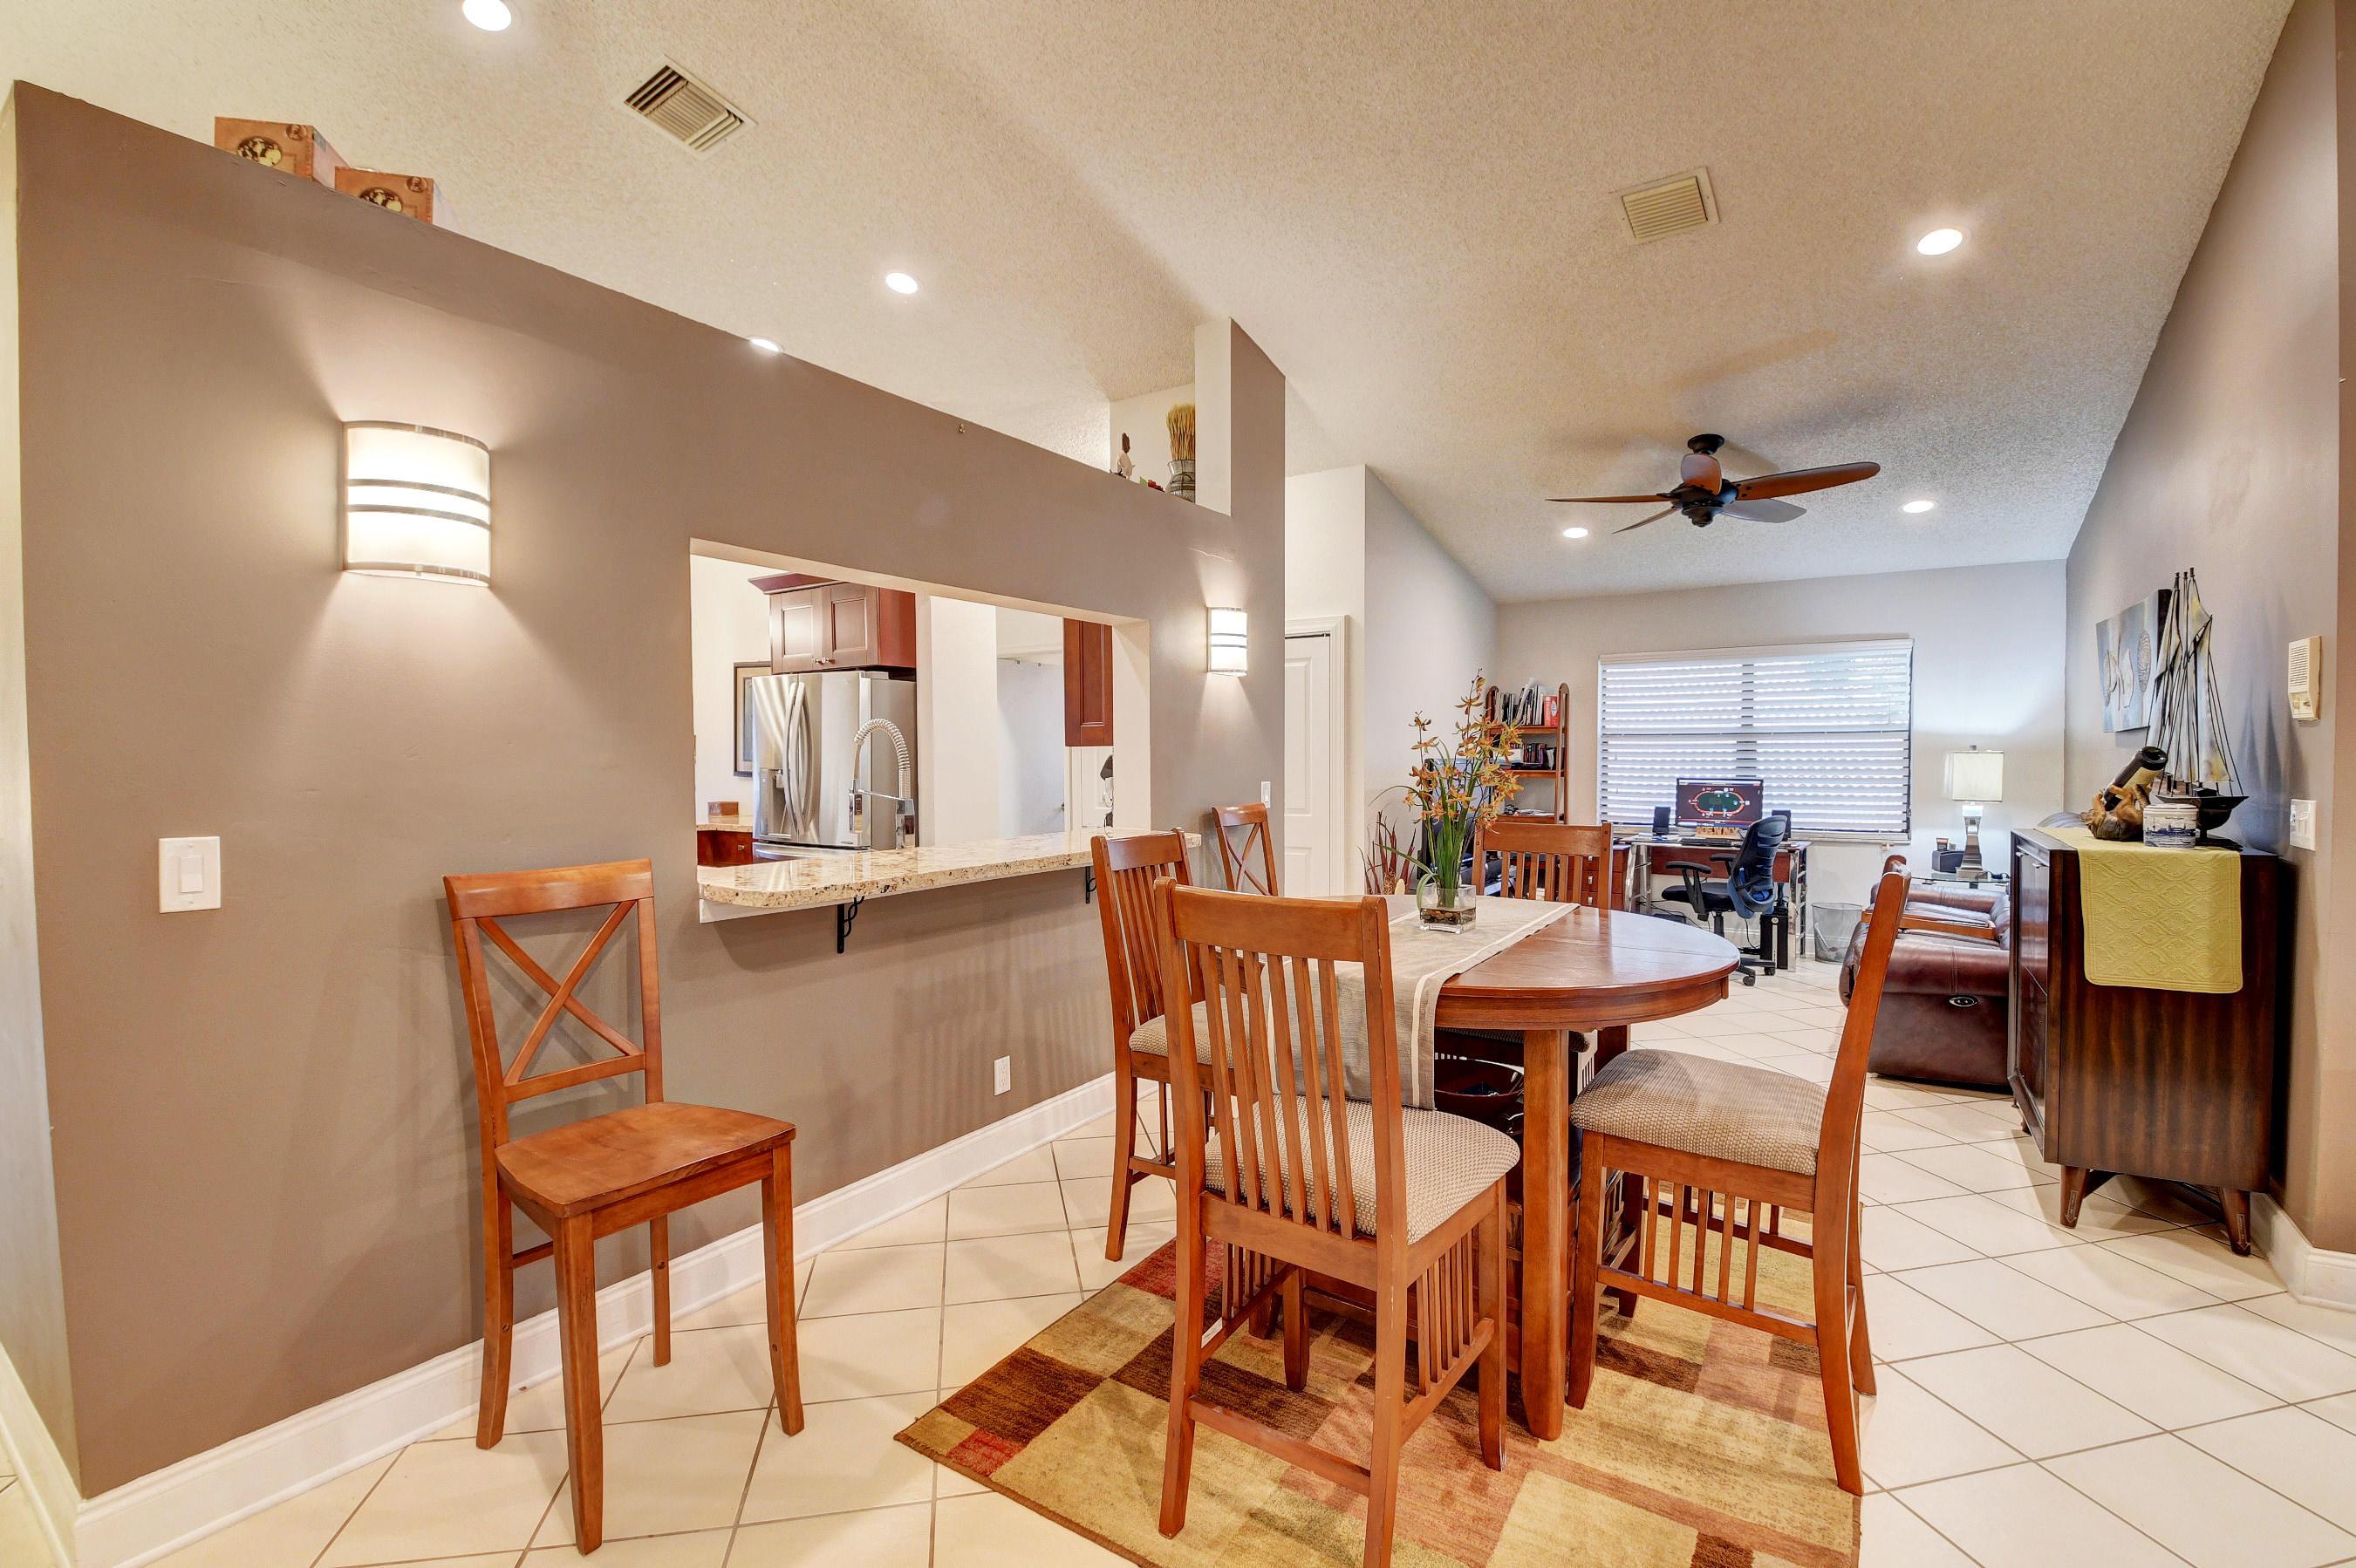 9628 Pavarotti Terrace 201 Boynton Beach, FL 33437 photo 20